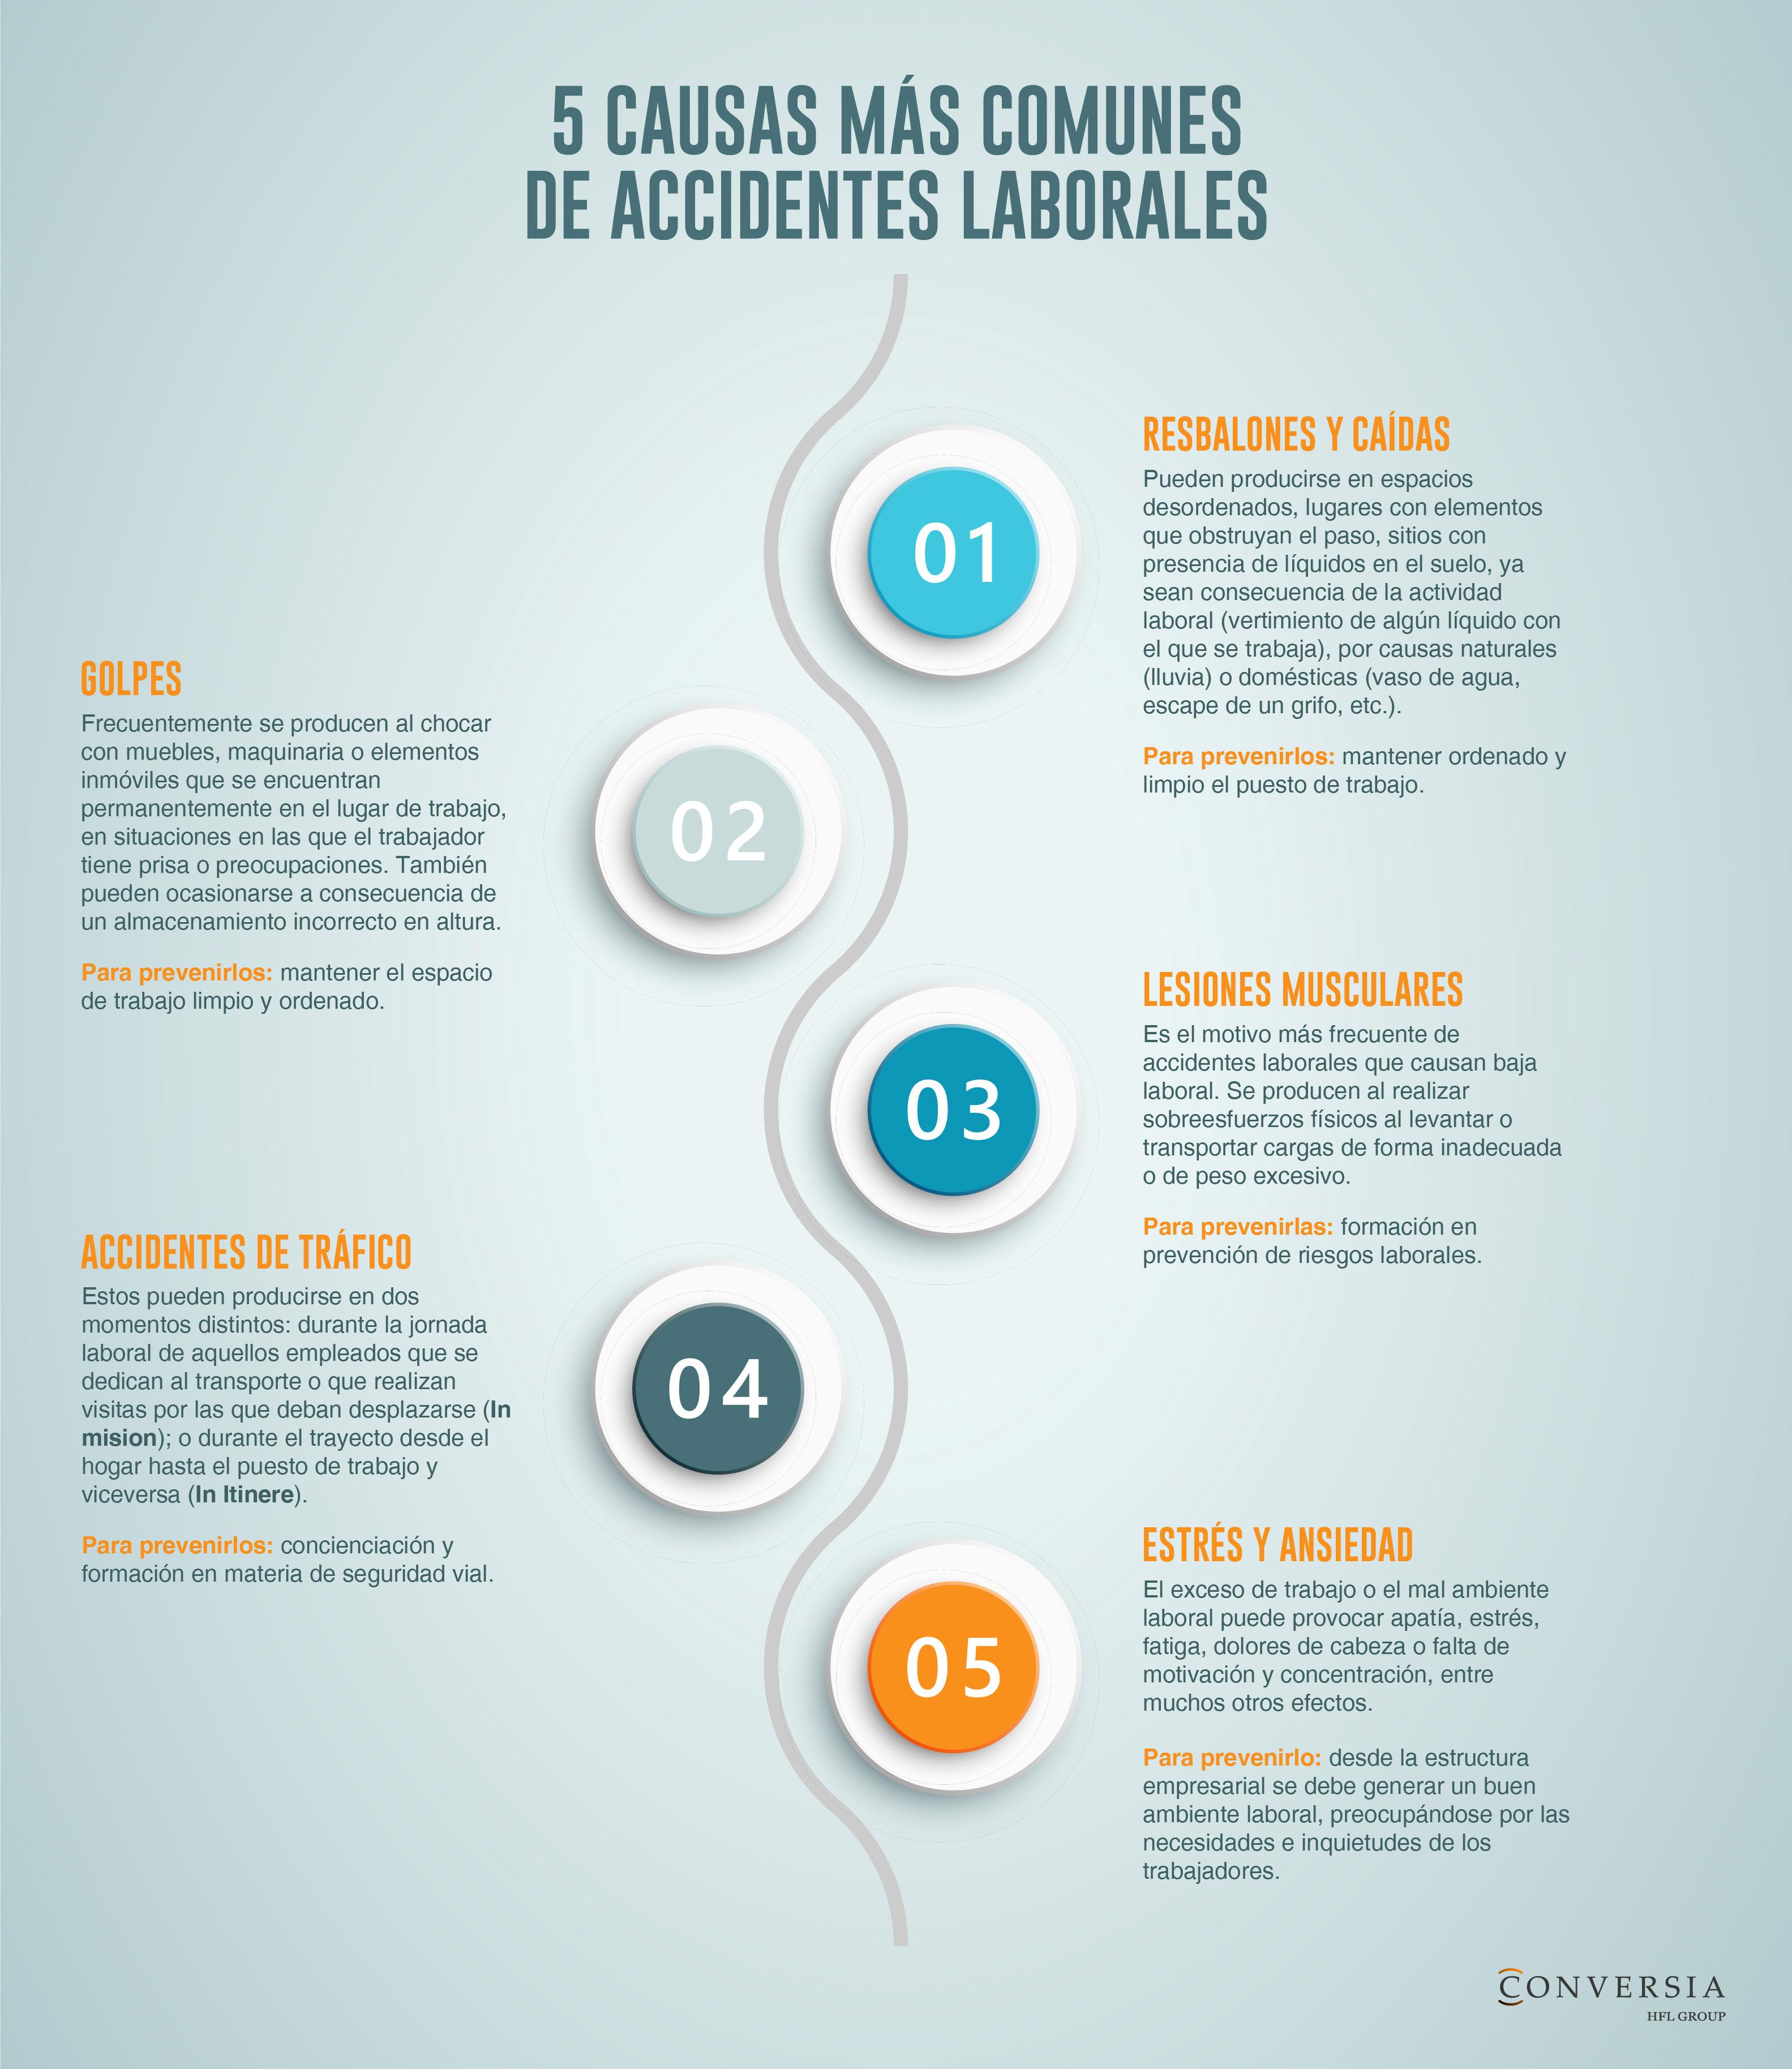 infografia conversia sobre accidentes laborales mas comunes